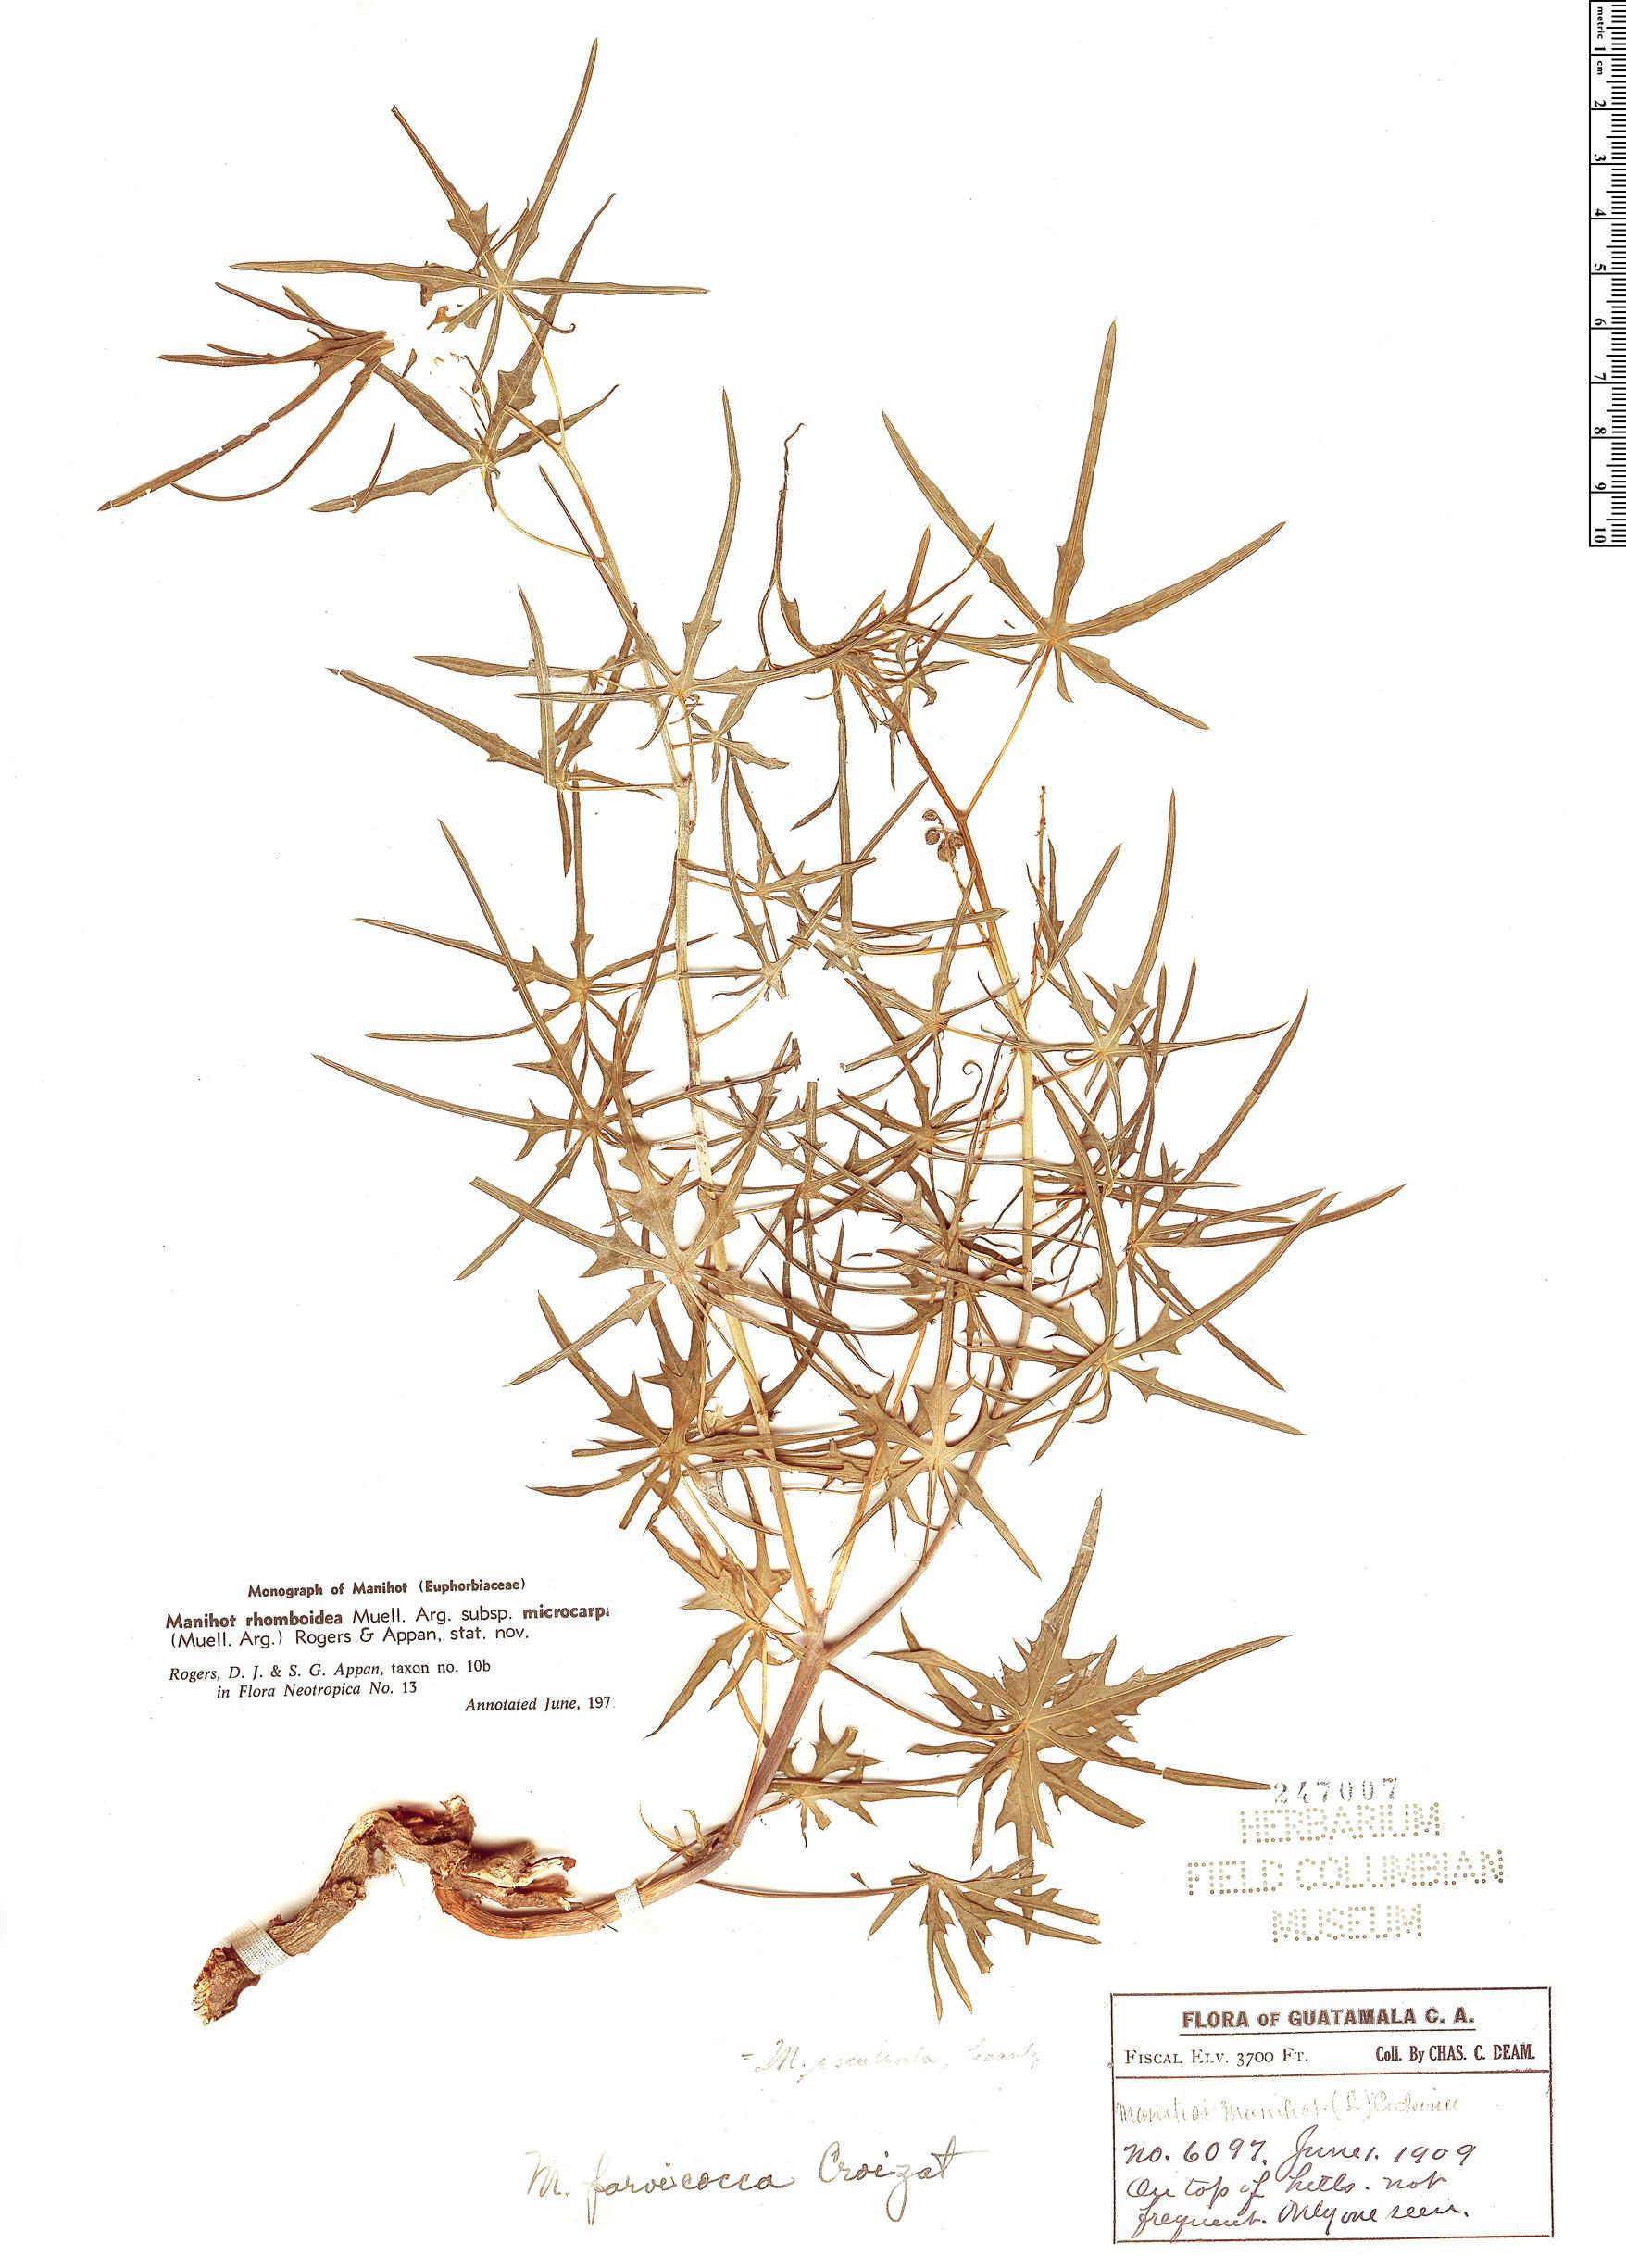 Specimen: Manihot rhomboidea